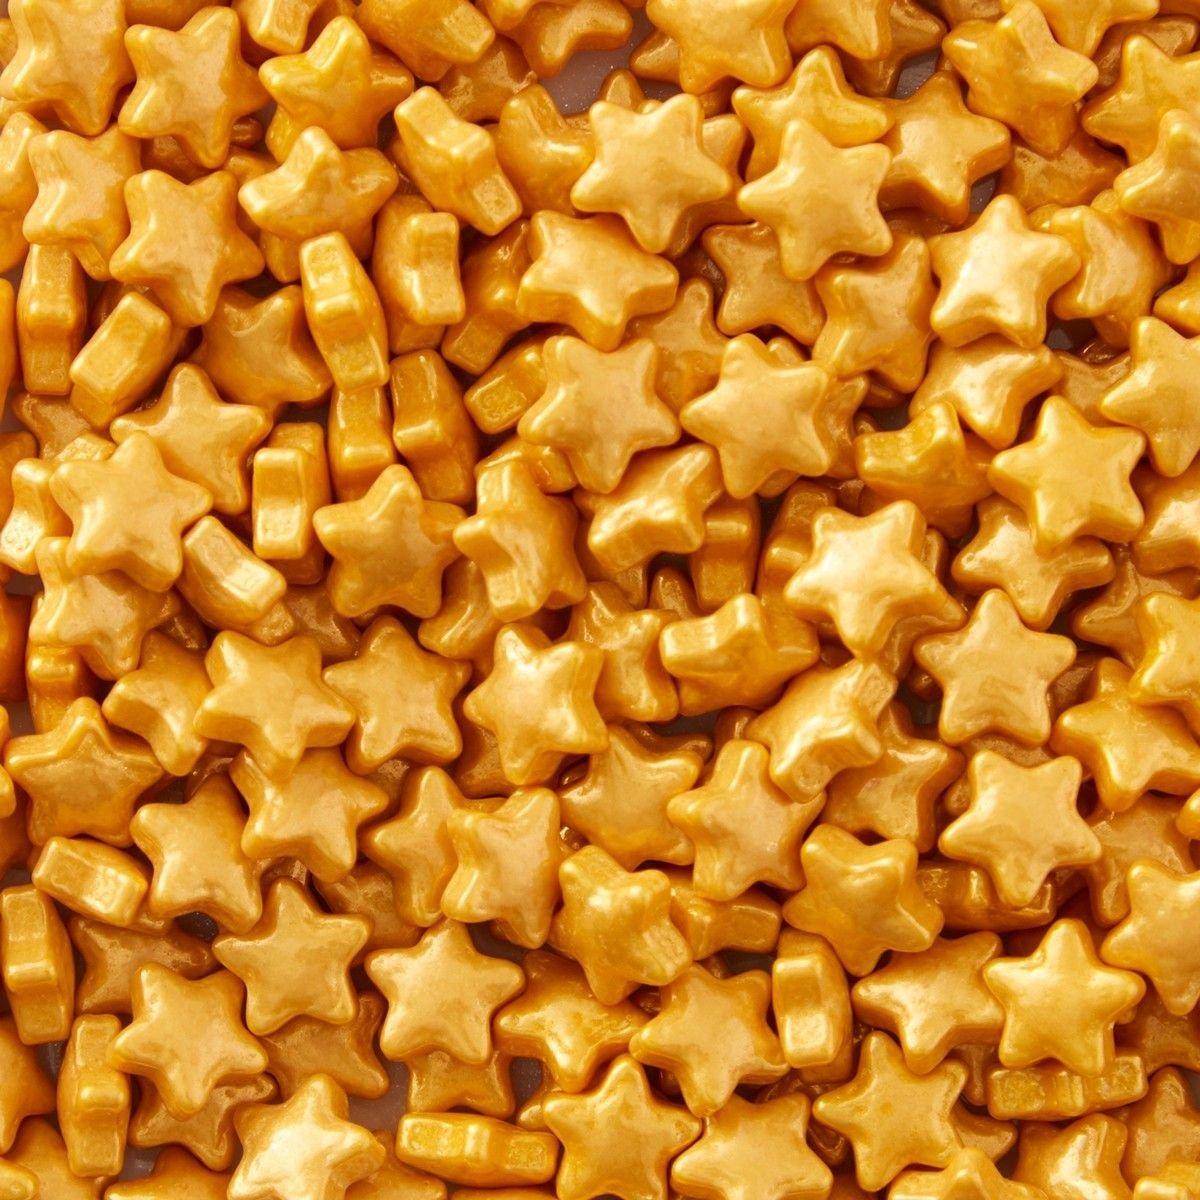 Wilton Sprinkles -GOLD STARS 56g - Βρώσιμα Ζαχαρωτά Χρυσά Αστέρια